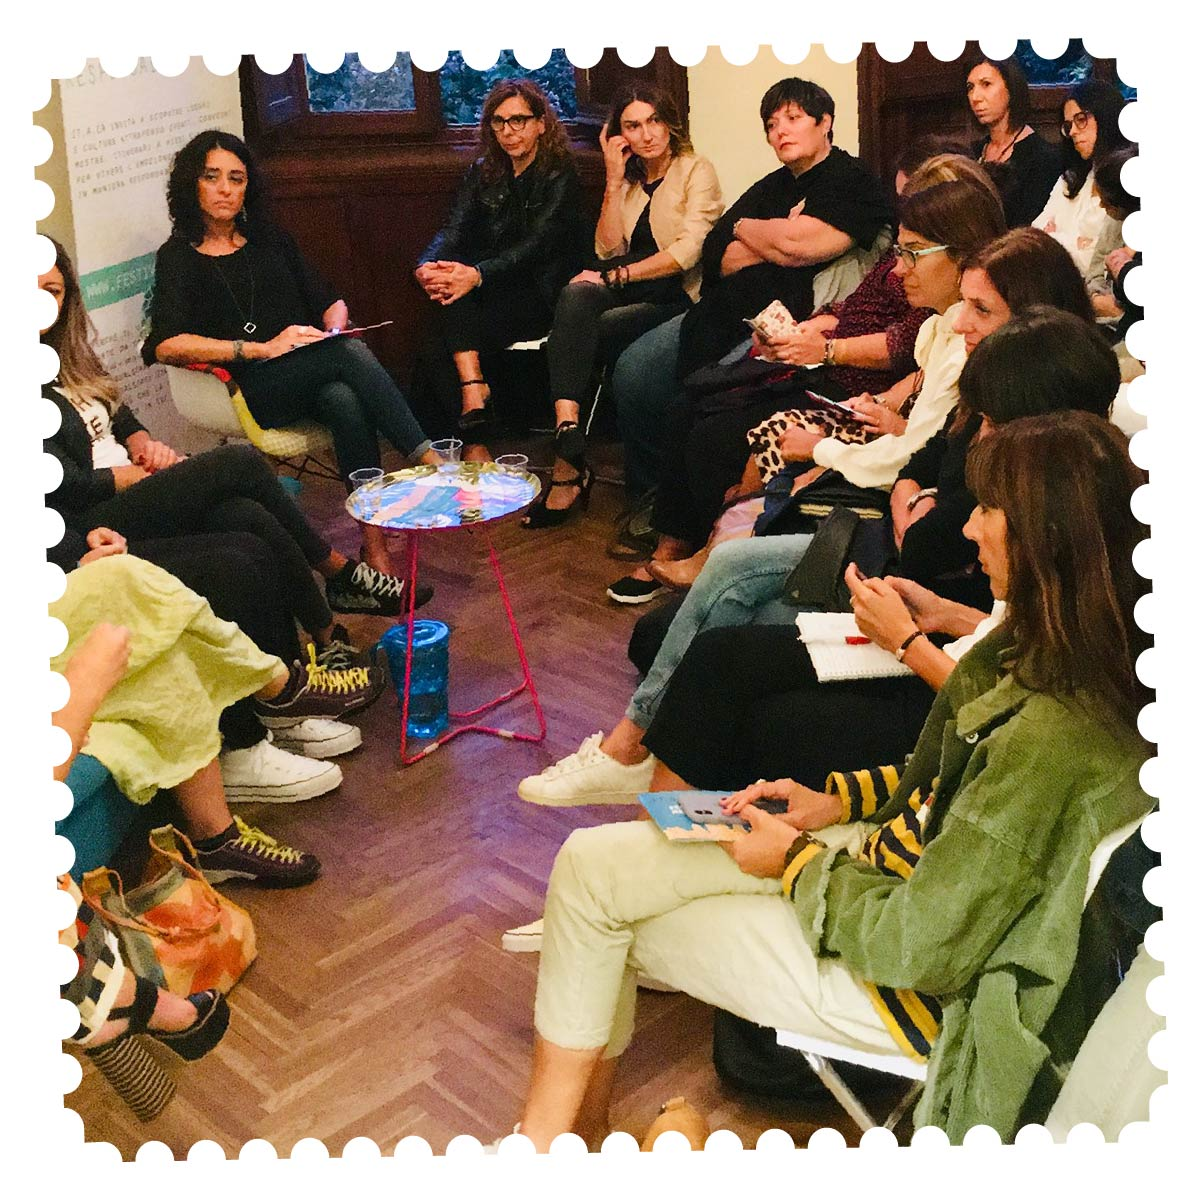 festival-itaca-strategia-eventi-turismo-sostenibile-sponsor-ravenna-6